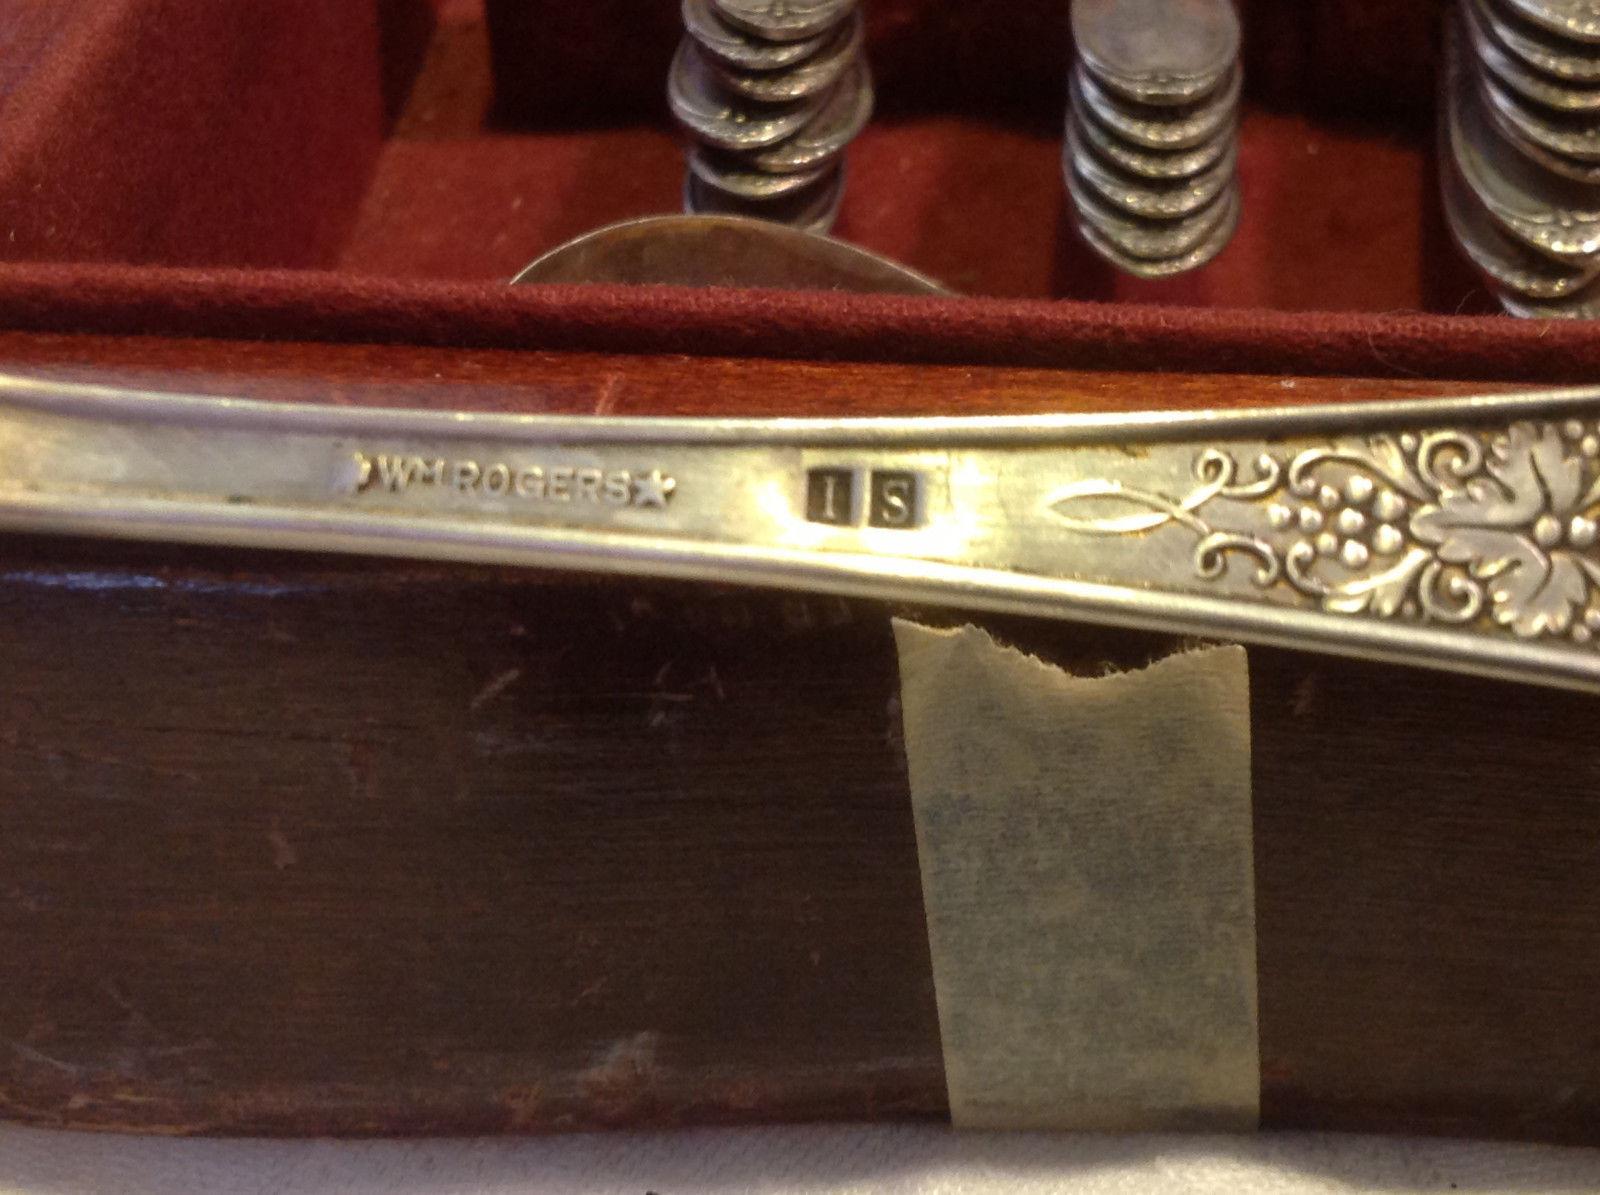 Vintage silverplate set Burgundy-Champaigne 1934 Wm Rogers Eagle & Star Mark